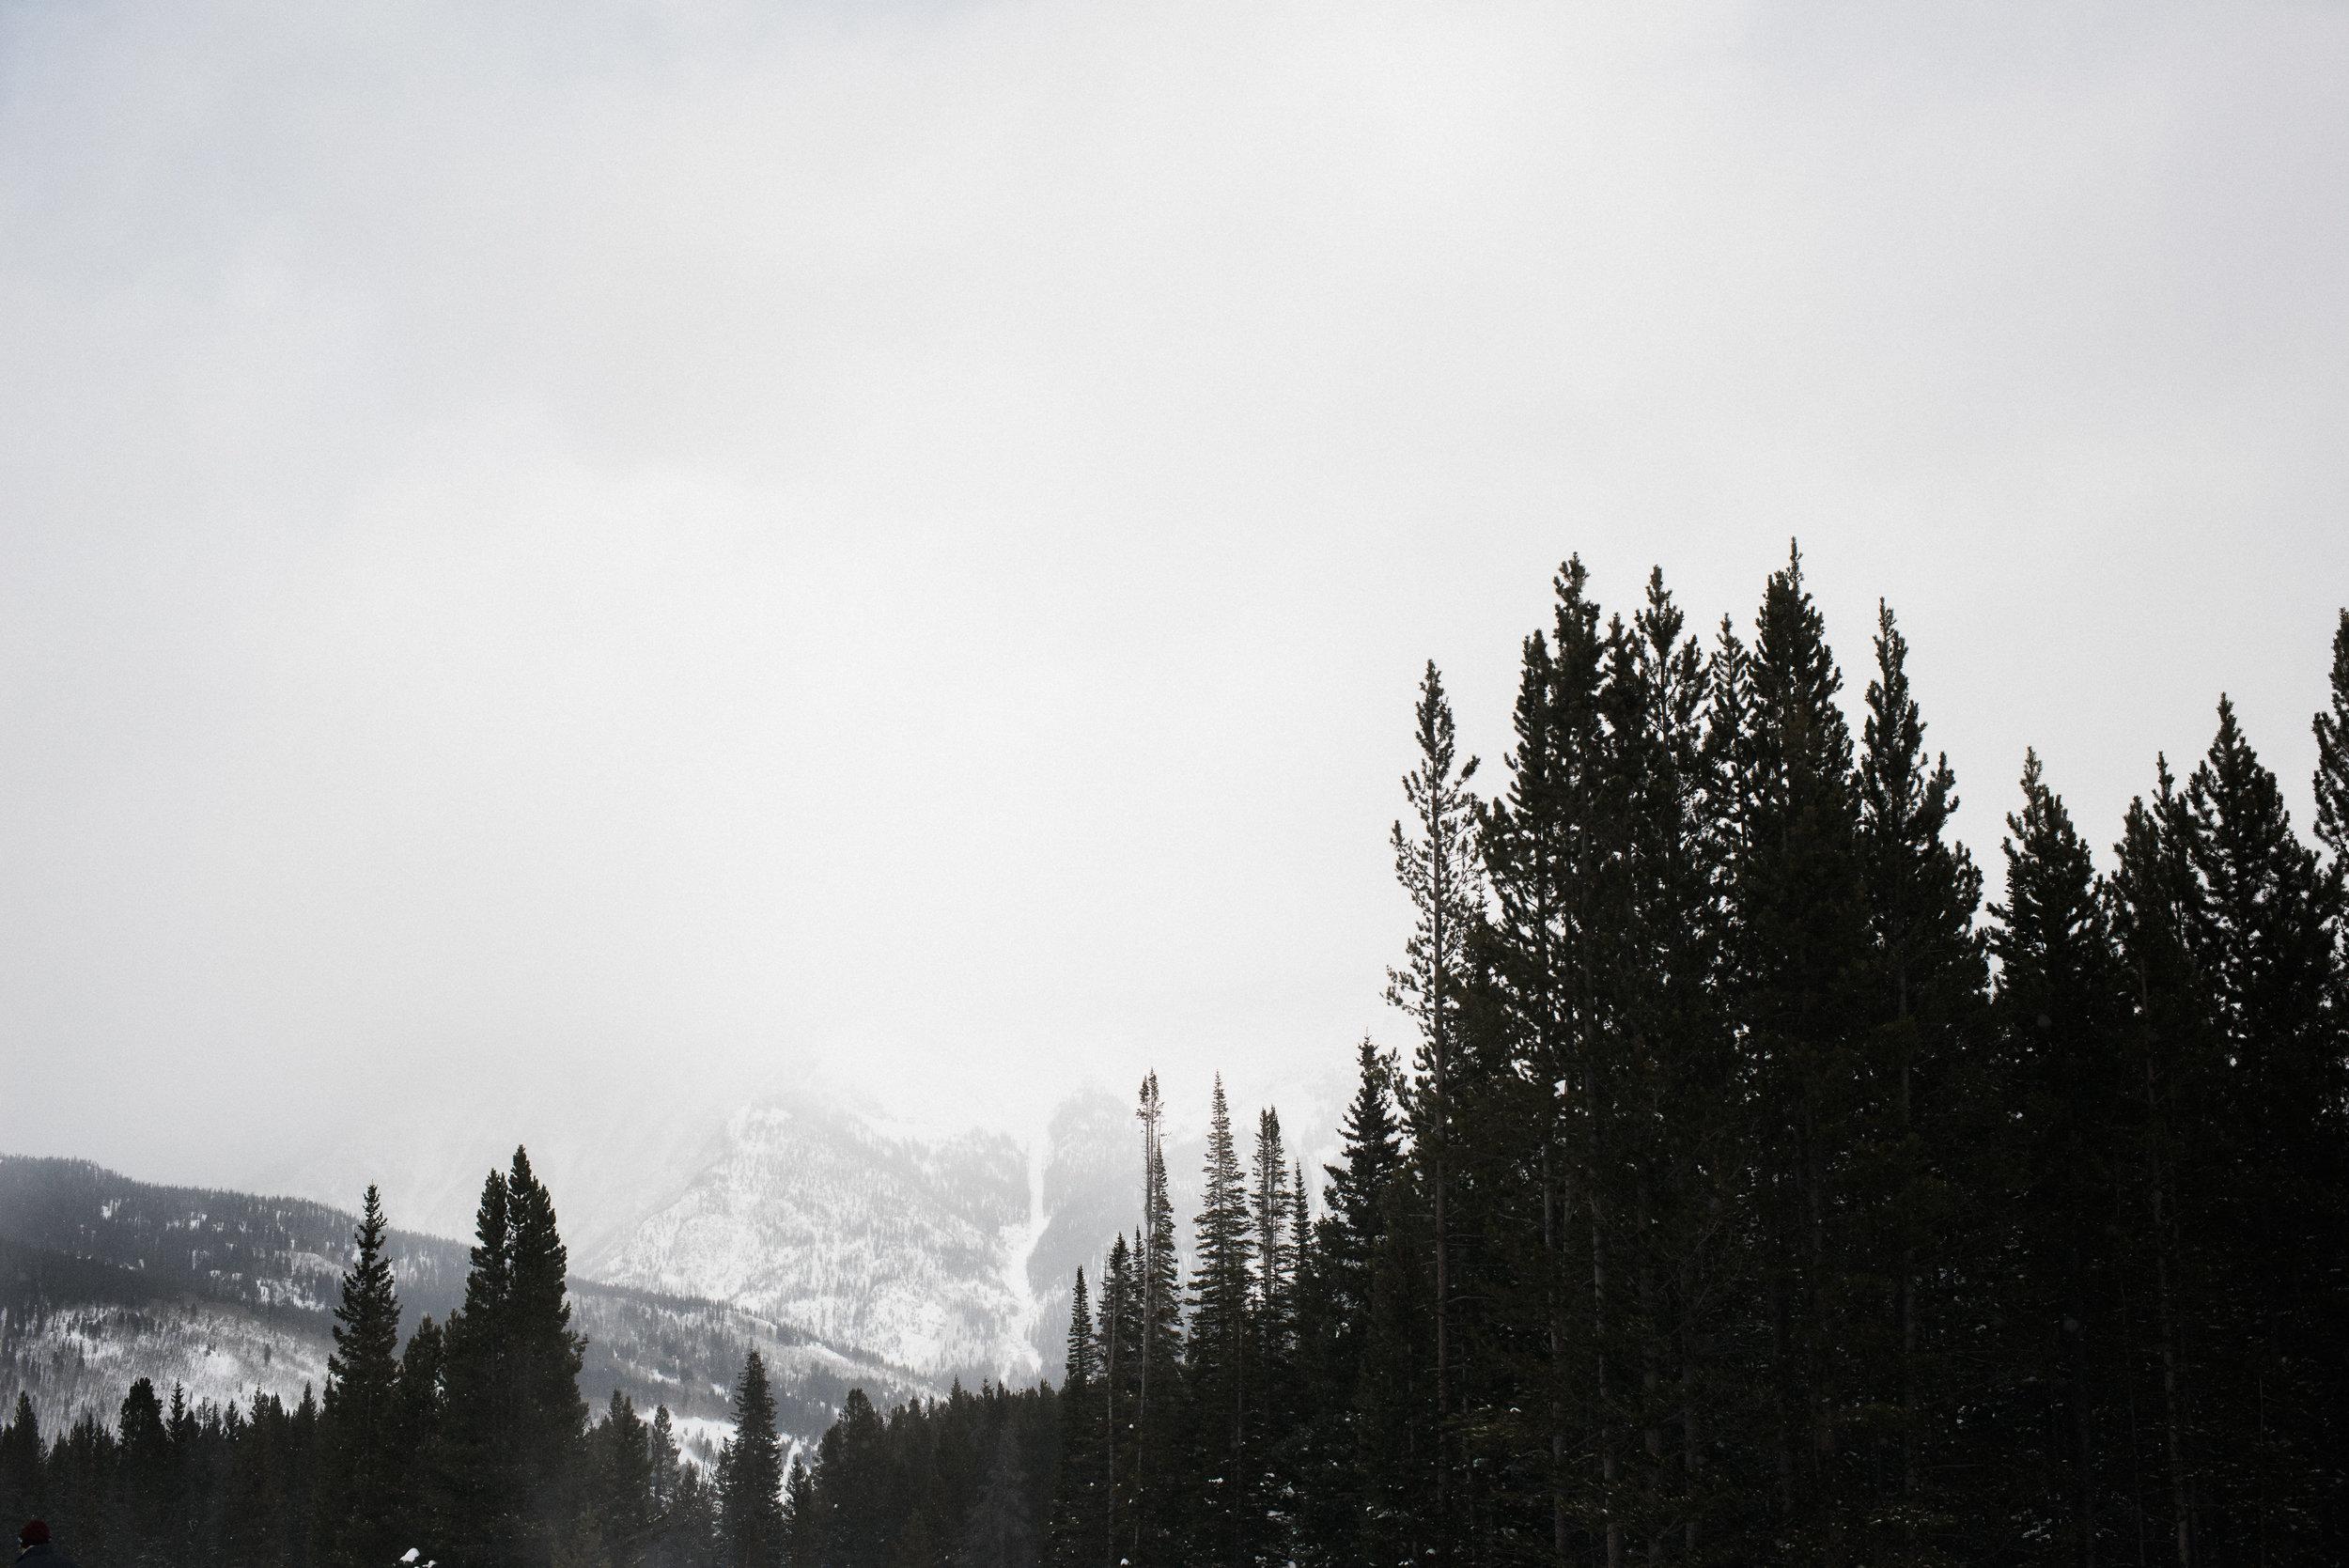 TaraShupe_Outdoor_Photographer_Loweprobags_Colorado_Copper_Mountains_Ski_28.jpg